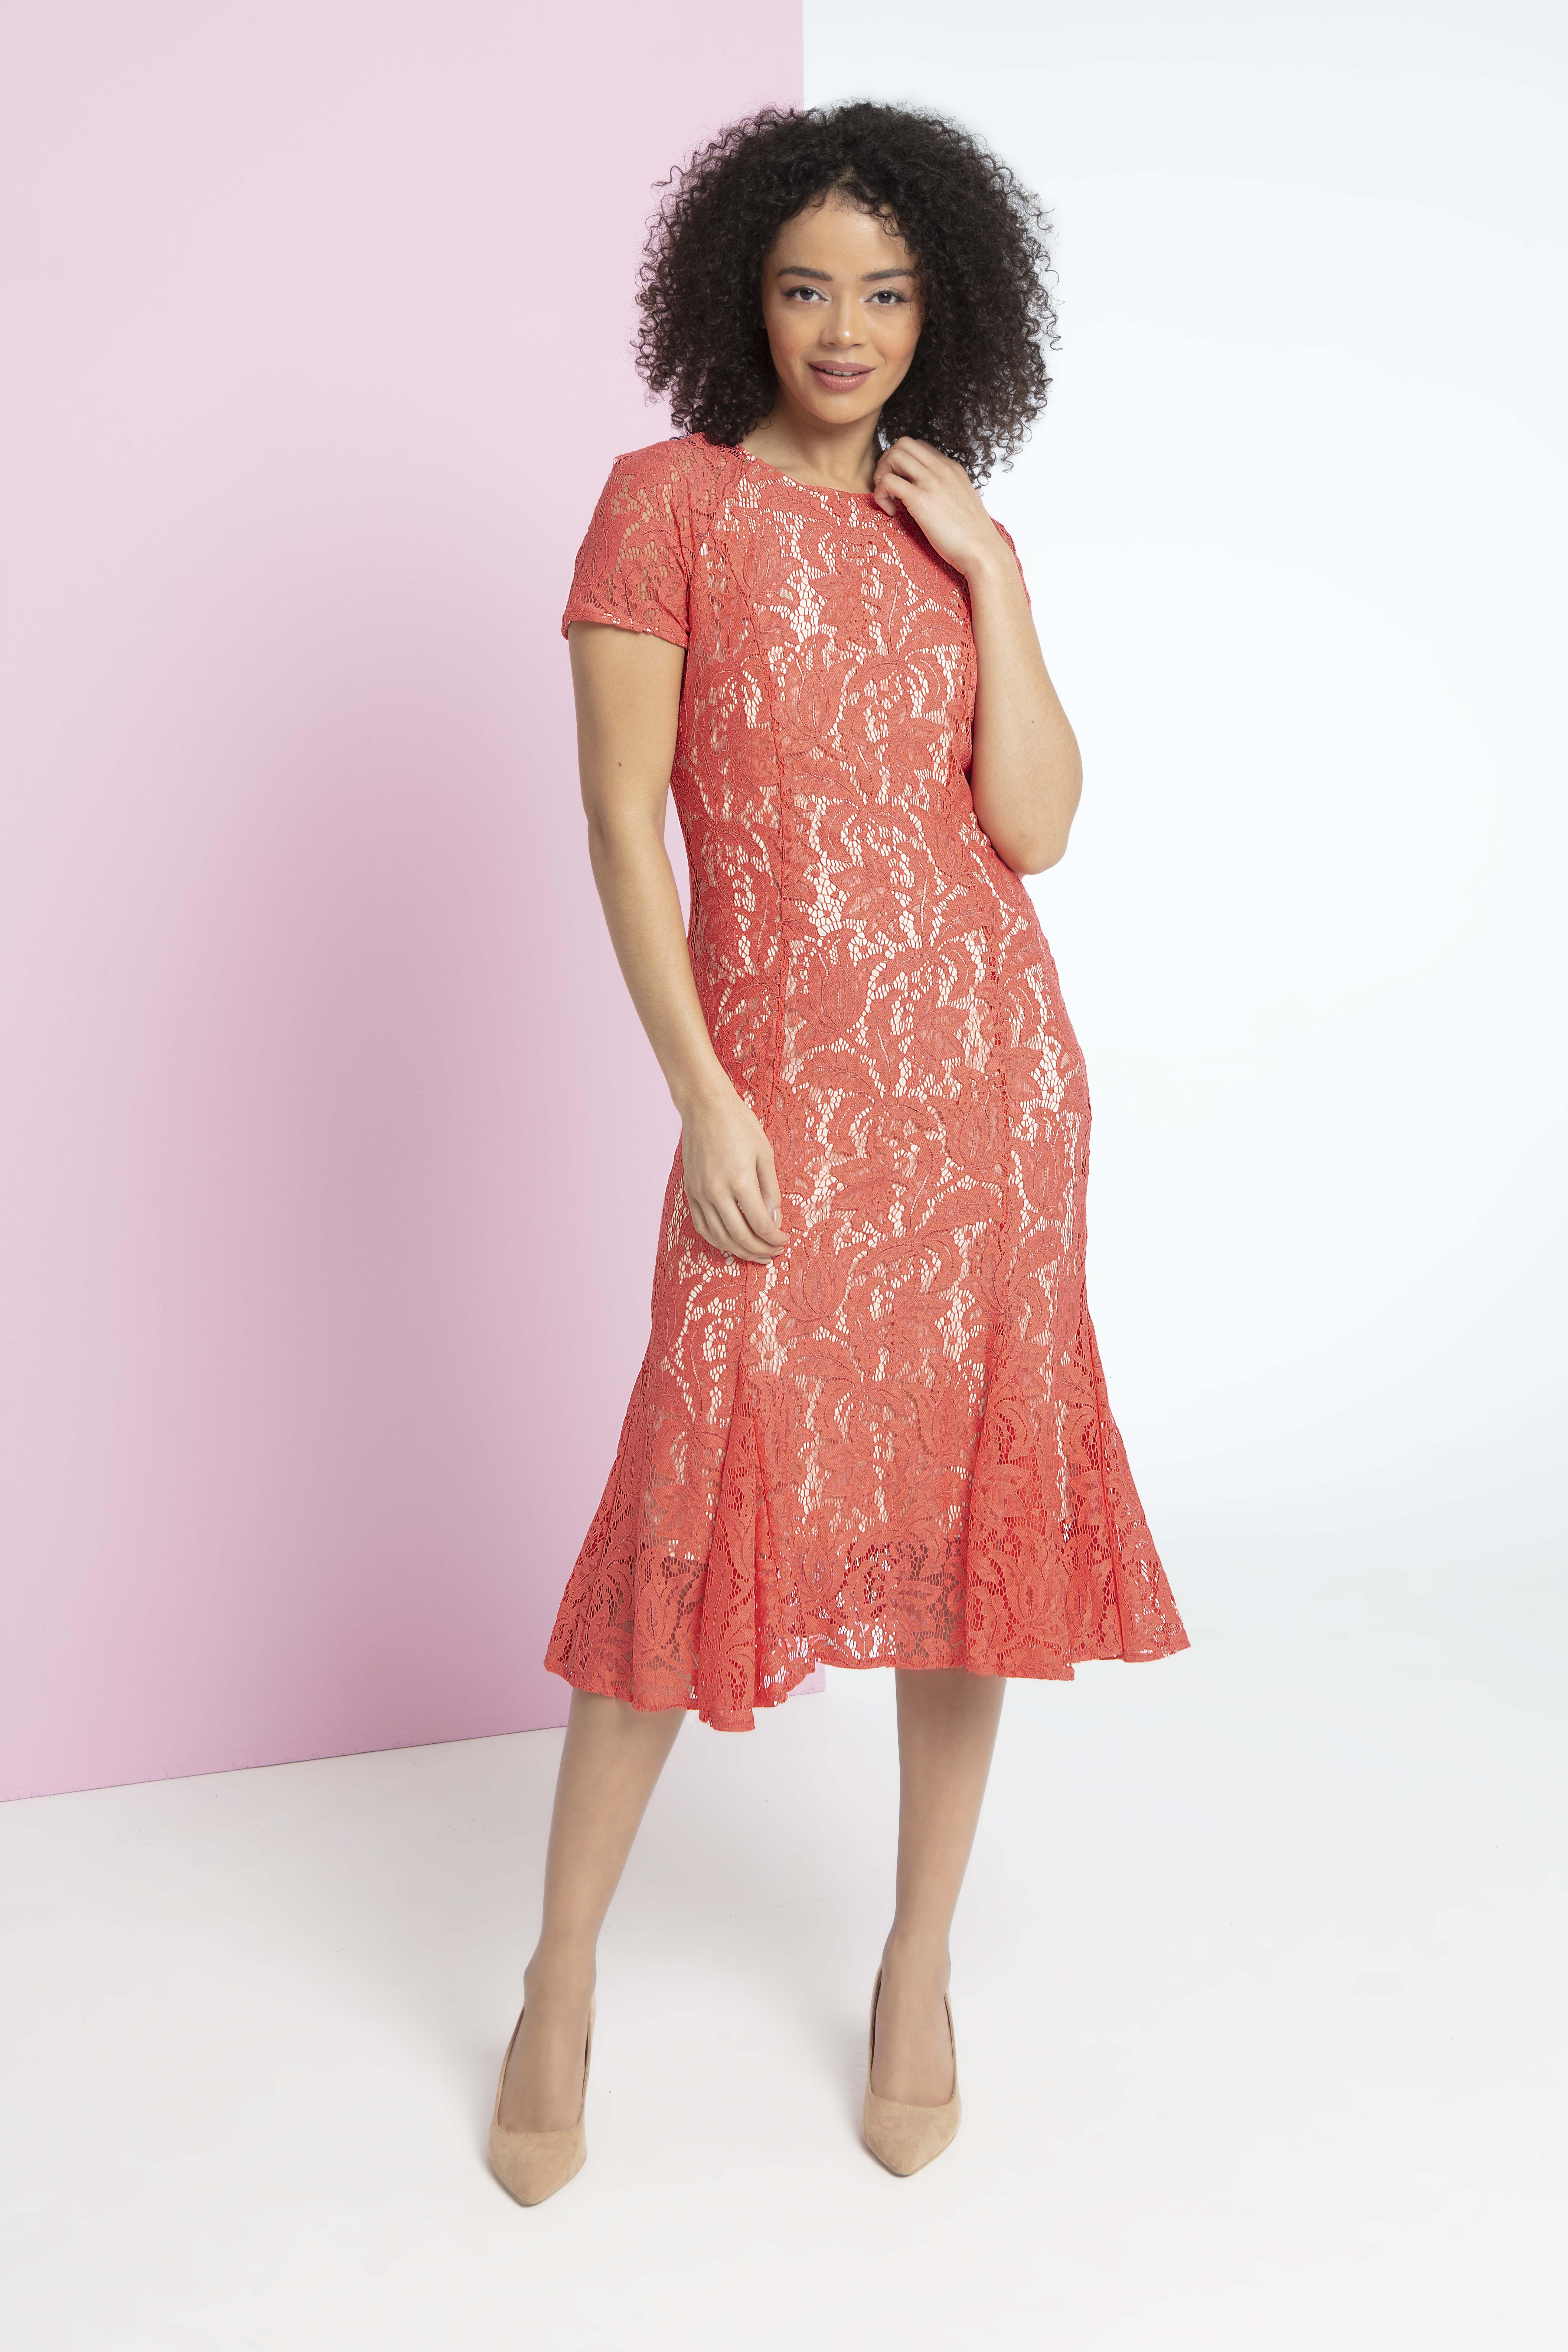 1a663edf9cdf7b Short Sleeve Dresses, Dresses With Sleeves, Short Sleeves, Roman Originals,  Lace Dress